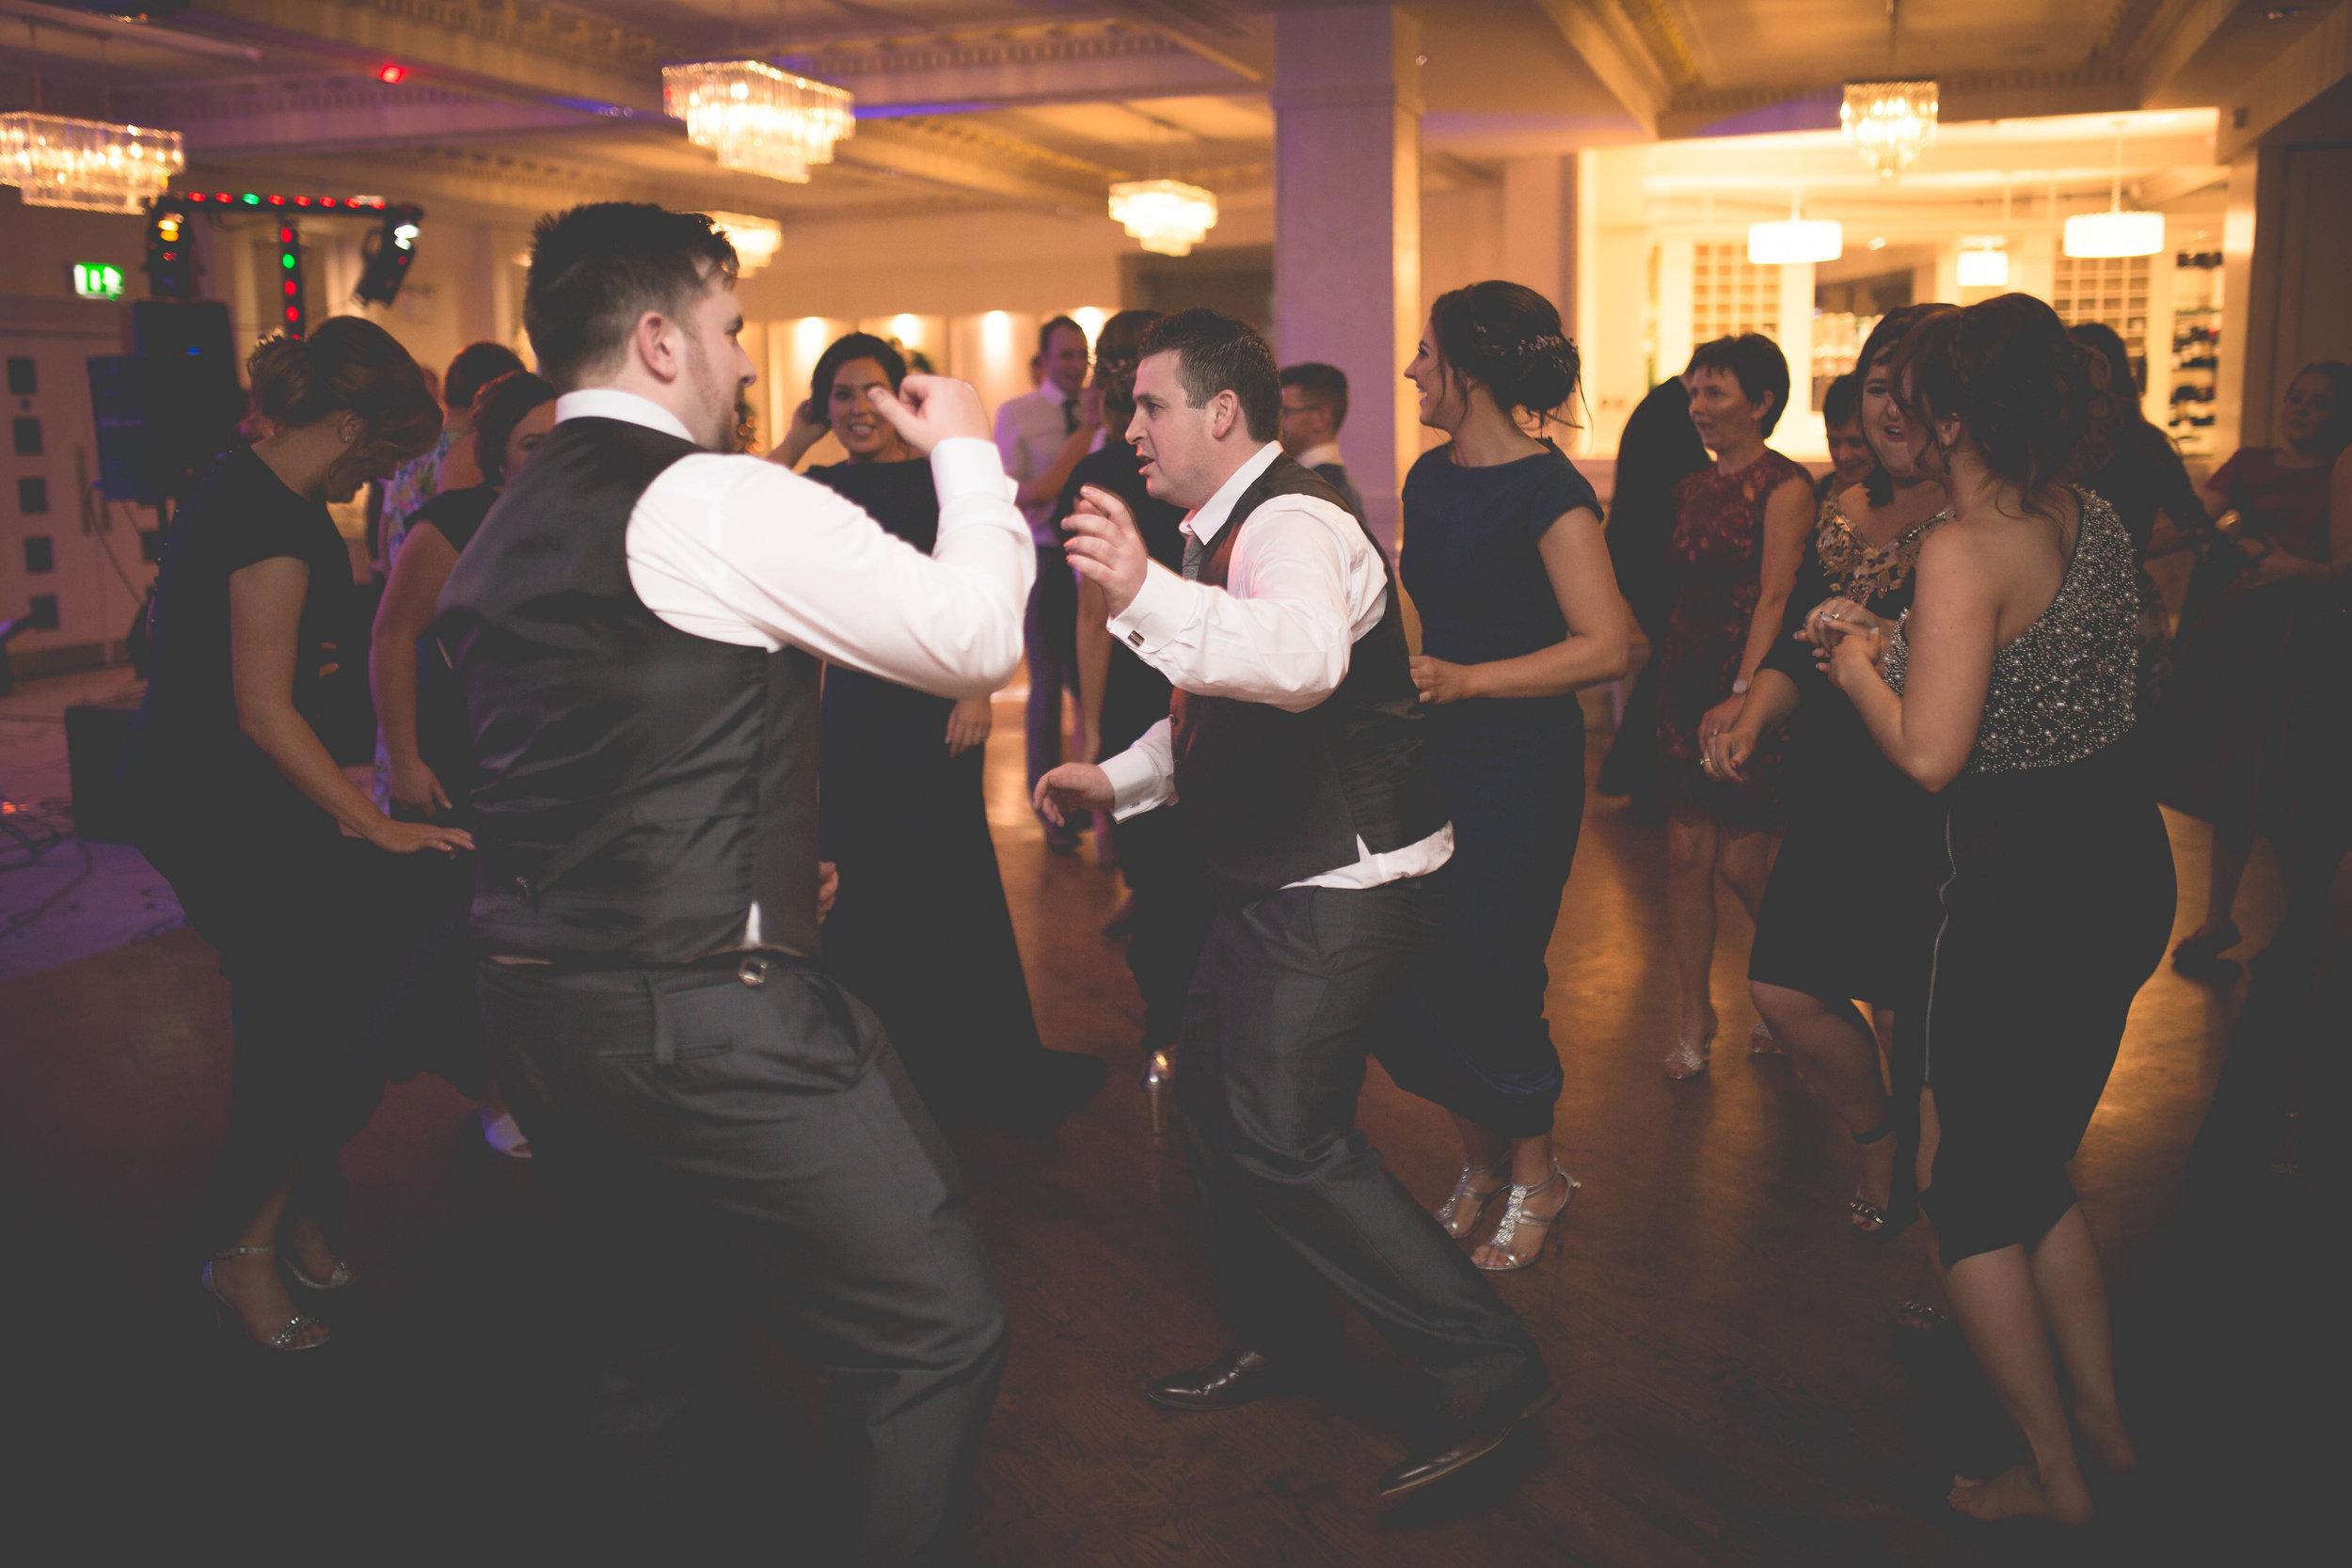 MaryJo_Conor_Mageean_Dancing-10.jpg